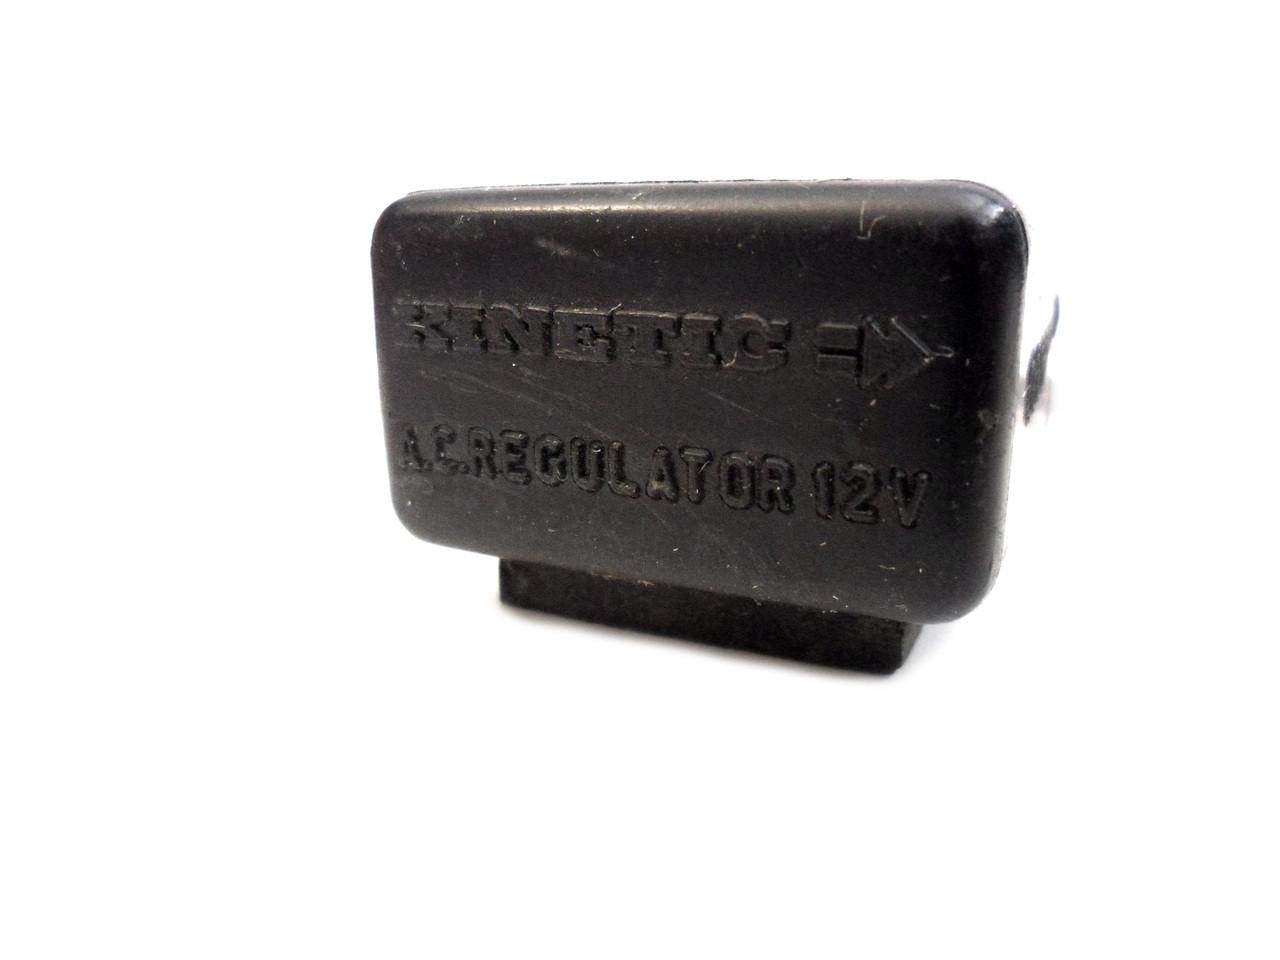 Original Kinetic Moped AC Voltage Regulator,  3 prong - Version 1